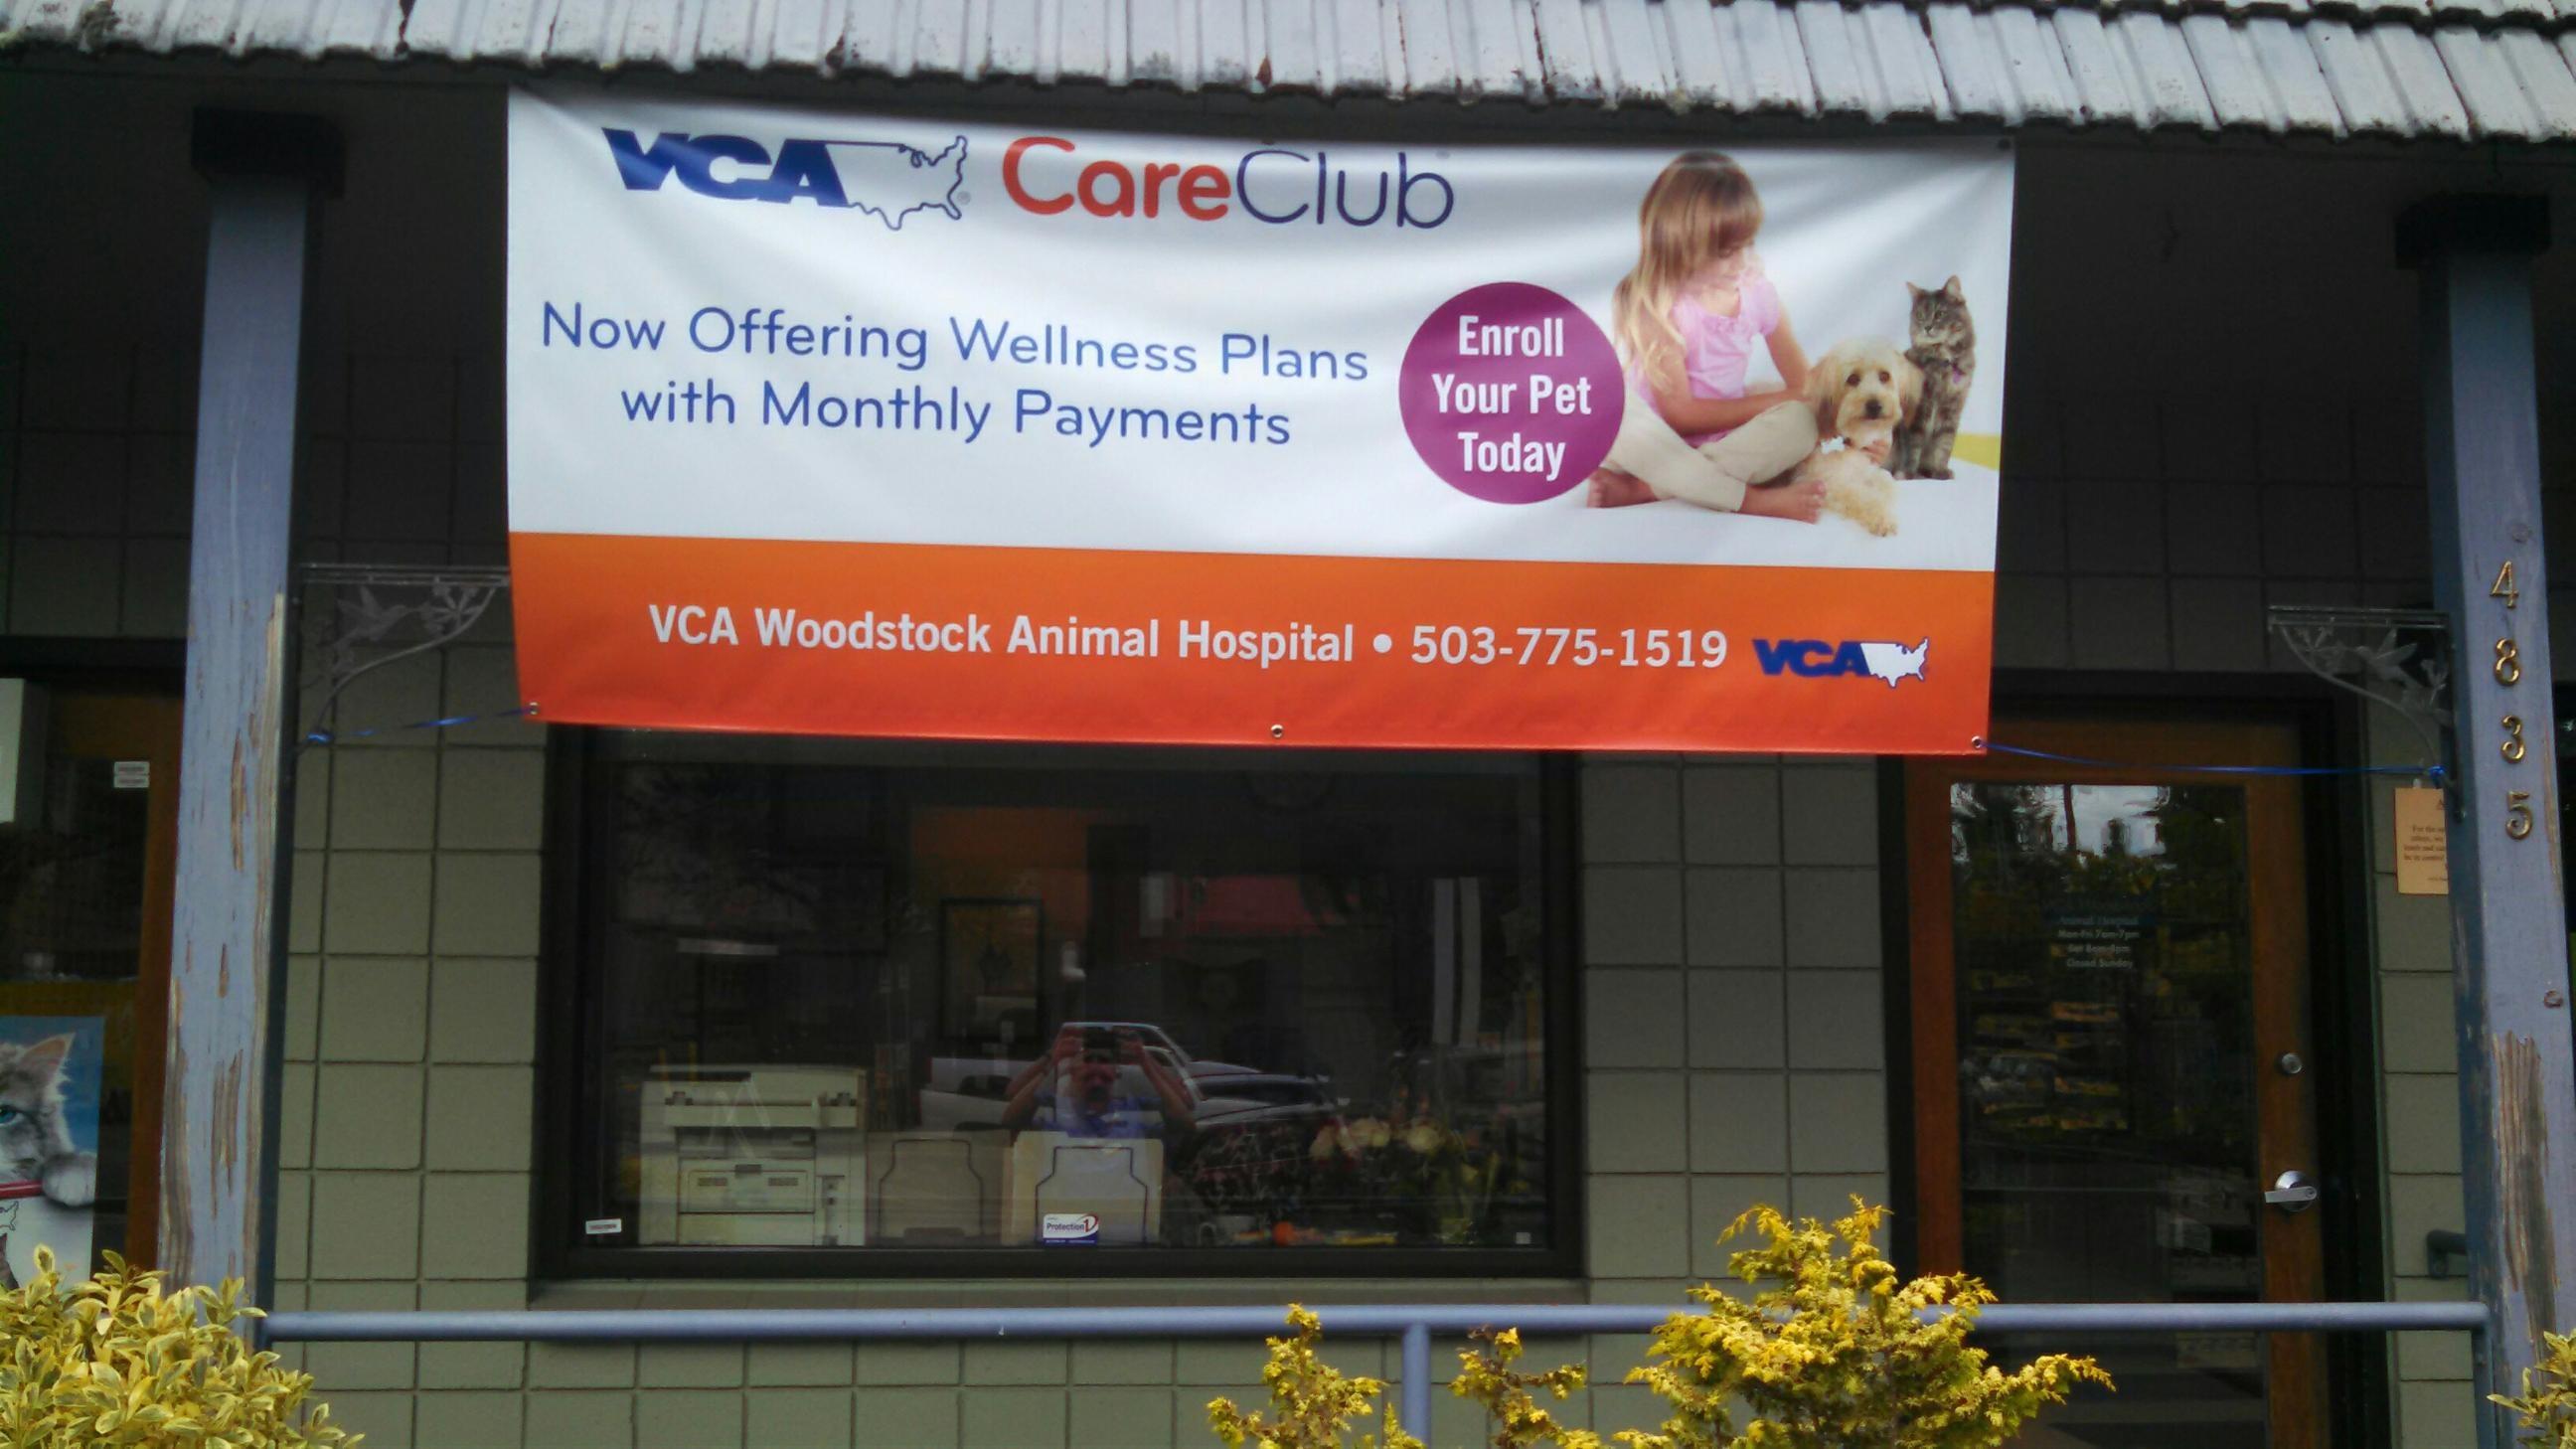 VCA Woodstock Animal Hospital image 6